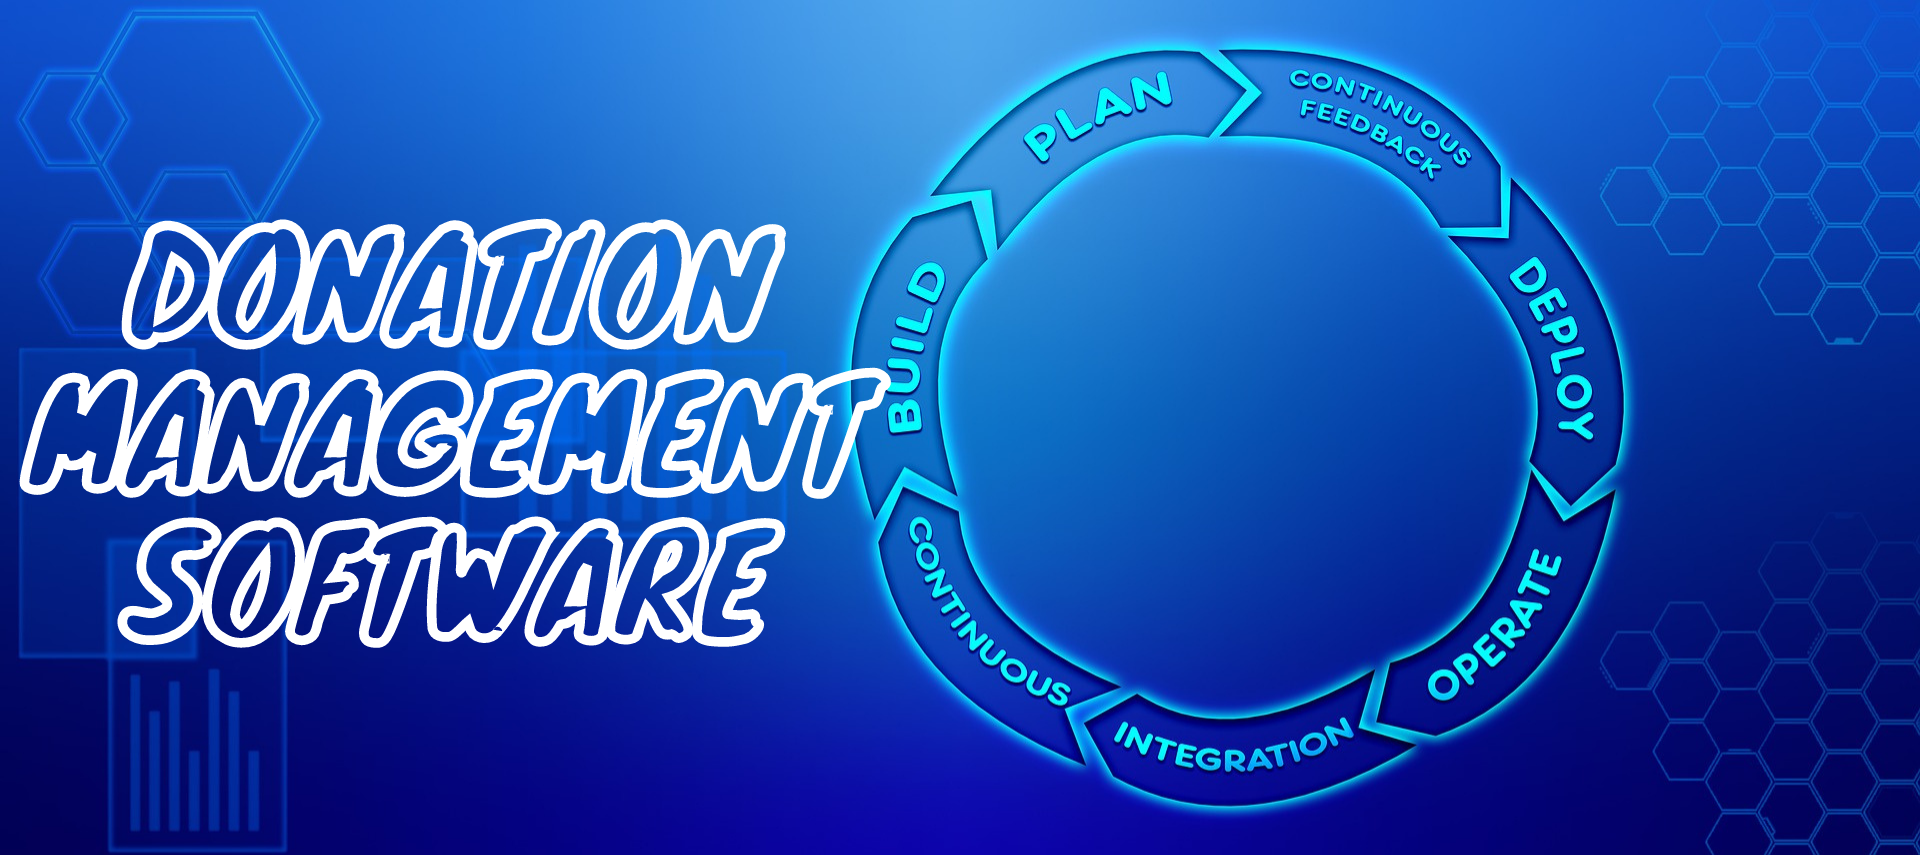 Donation Management Software